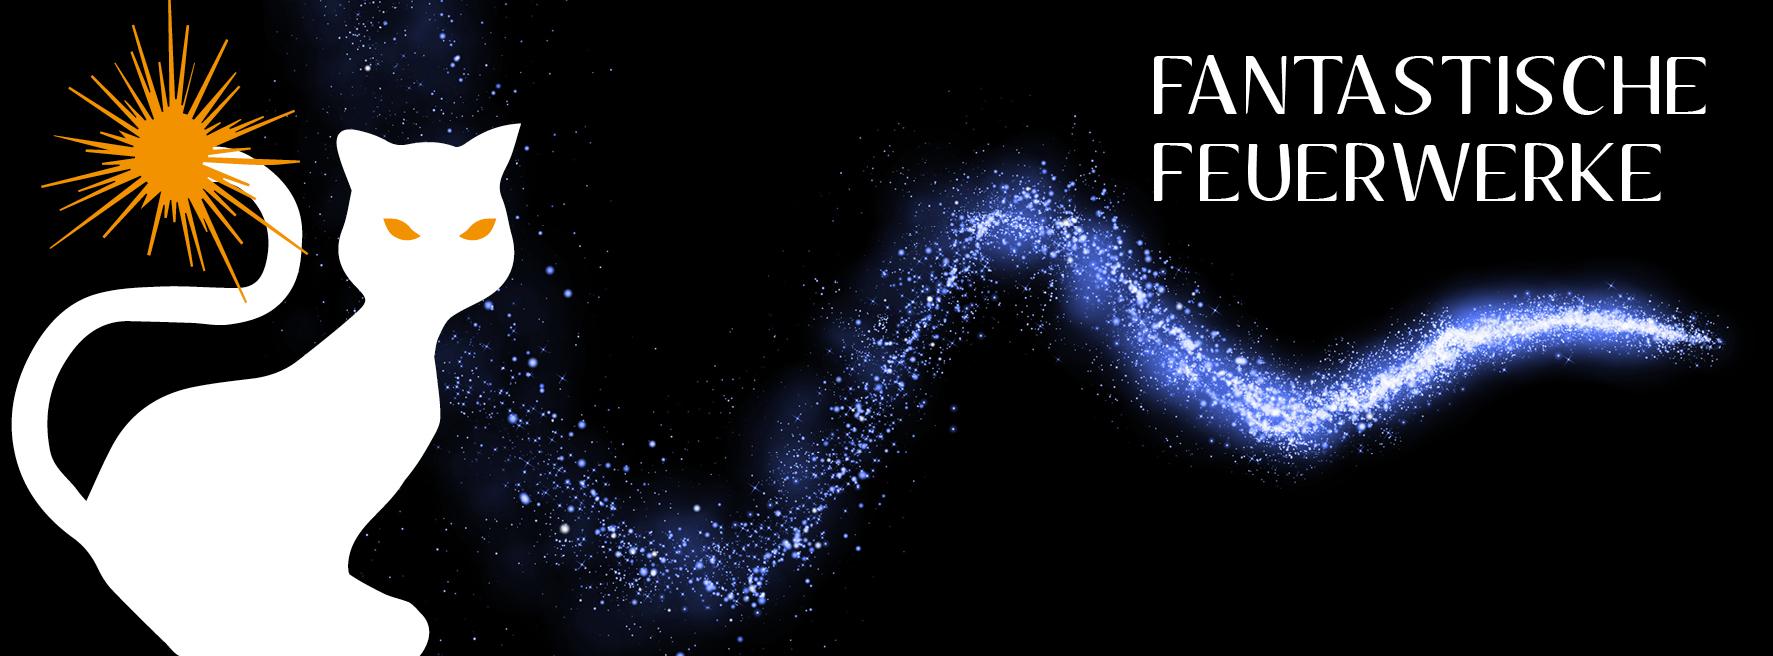 FWS_001